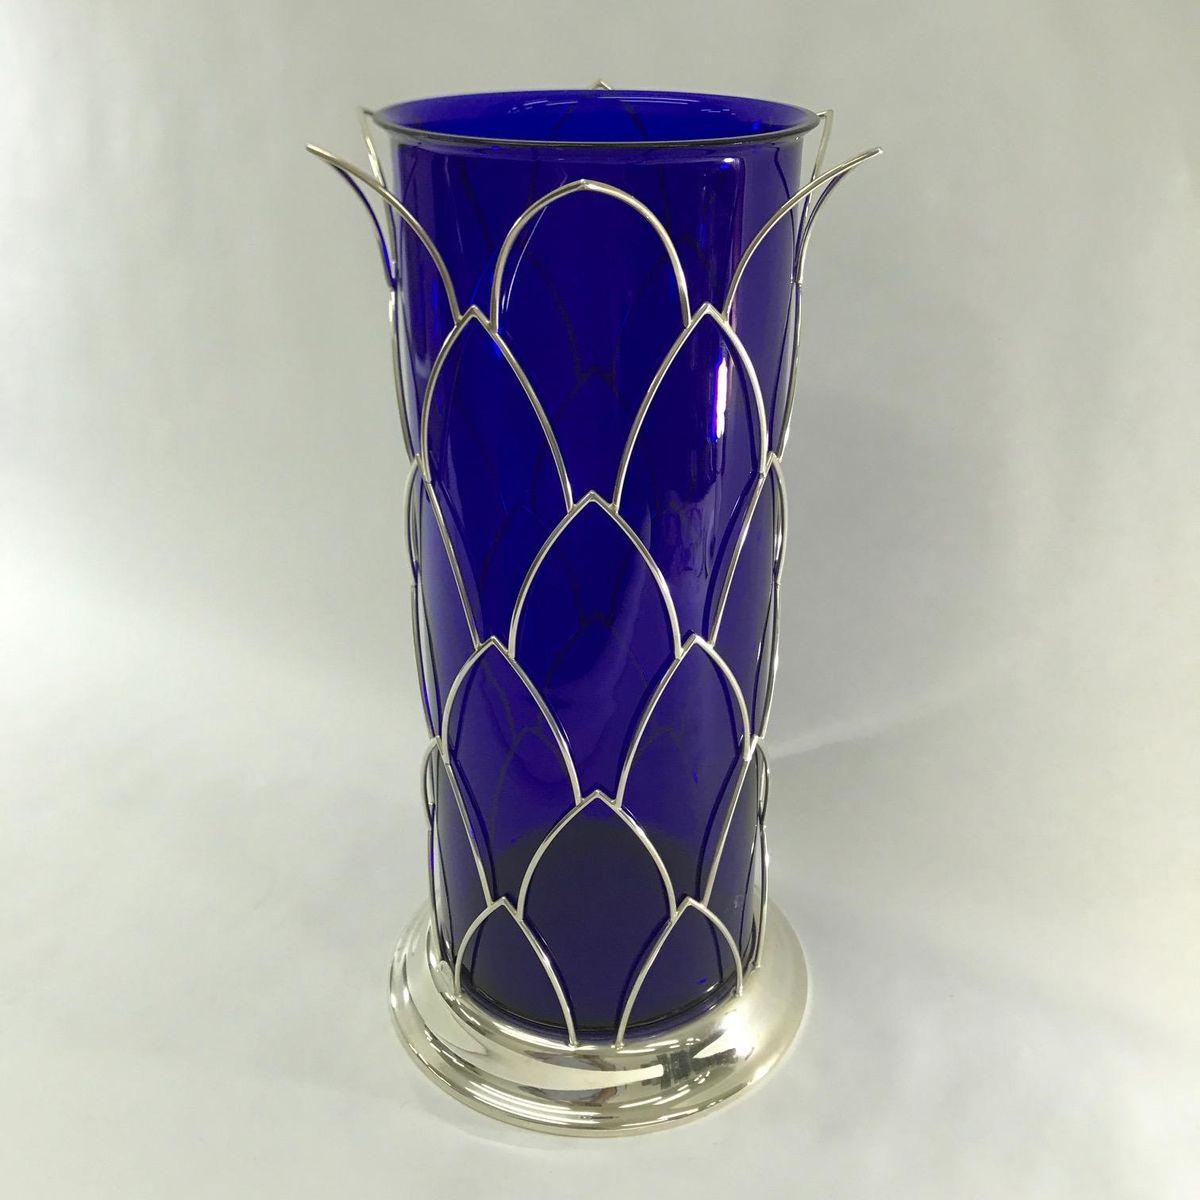 Vintage italian blue murano glass vase from cleto munari 1980s vintage italian blue murano glass vase from cleto munari 1980s reviewsmspy